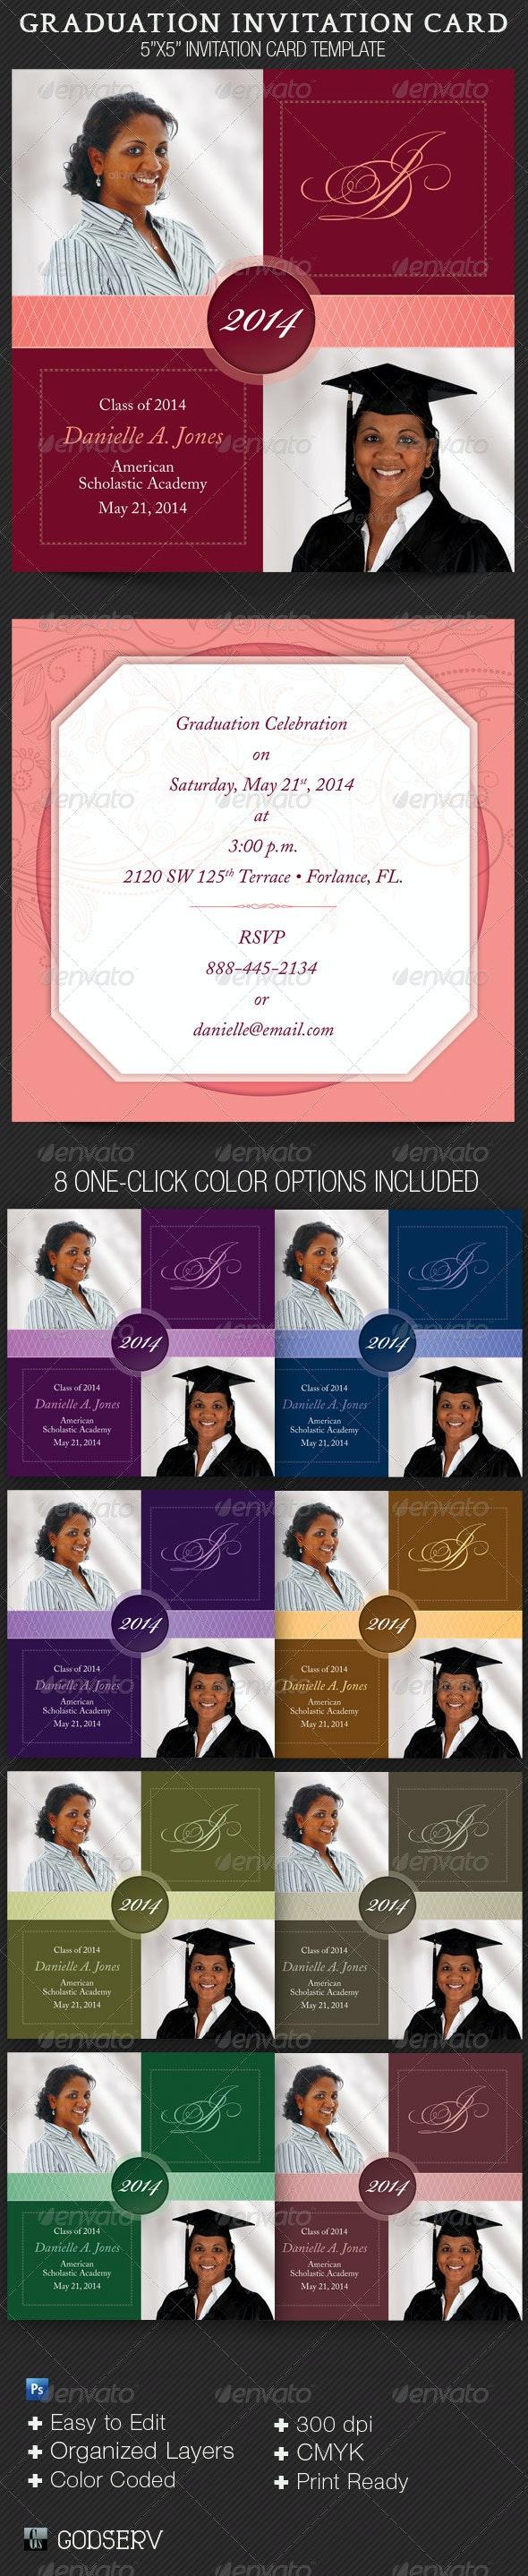 Graduation Invitation Card Template - Invitations Cards & Invites